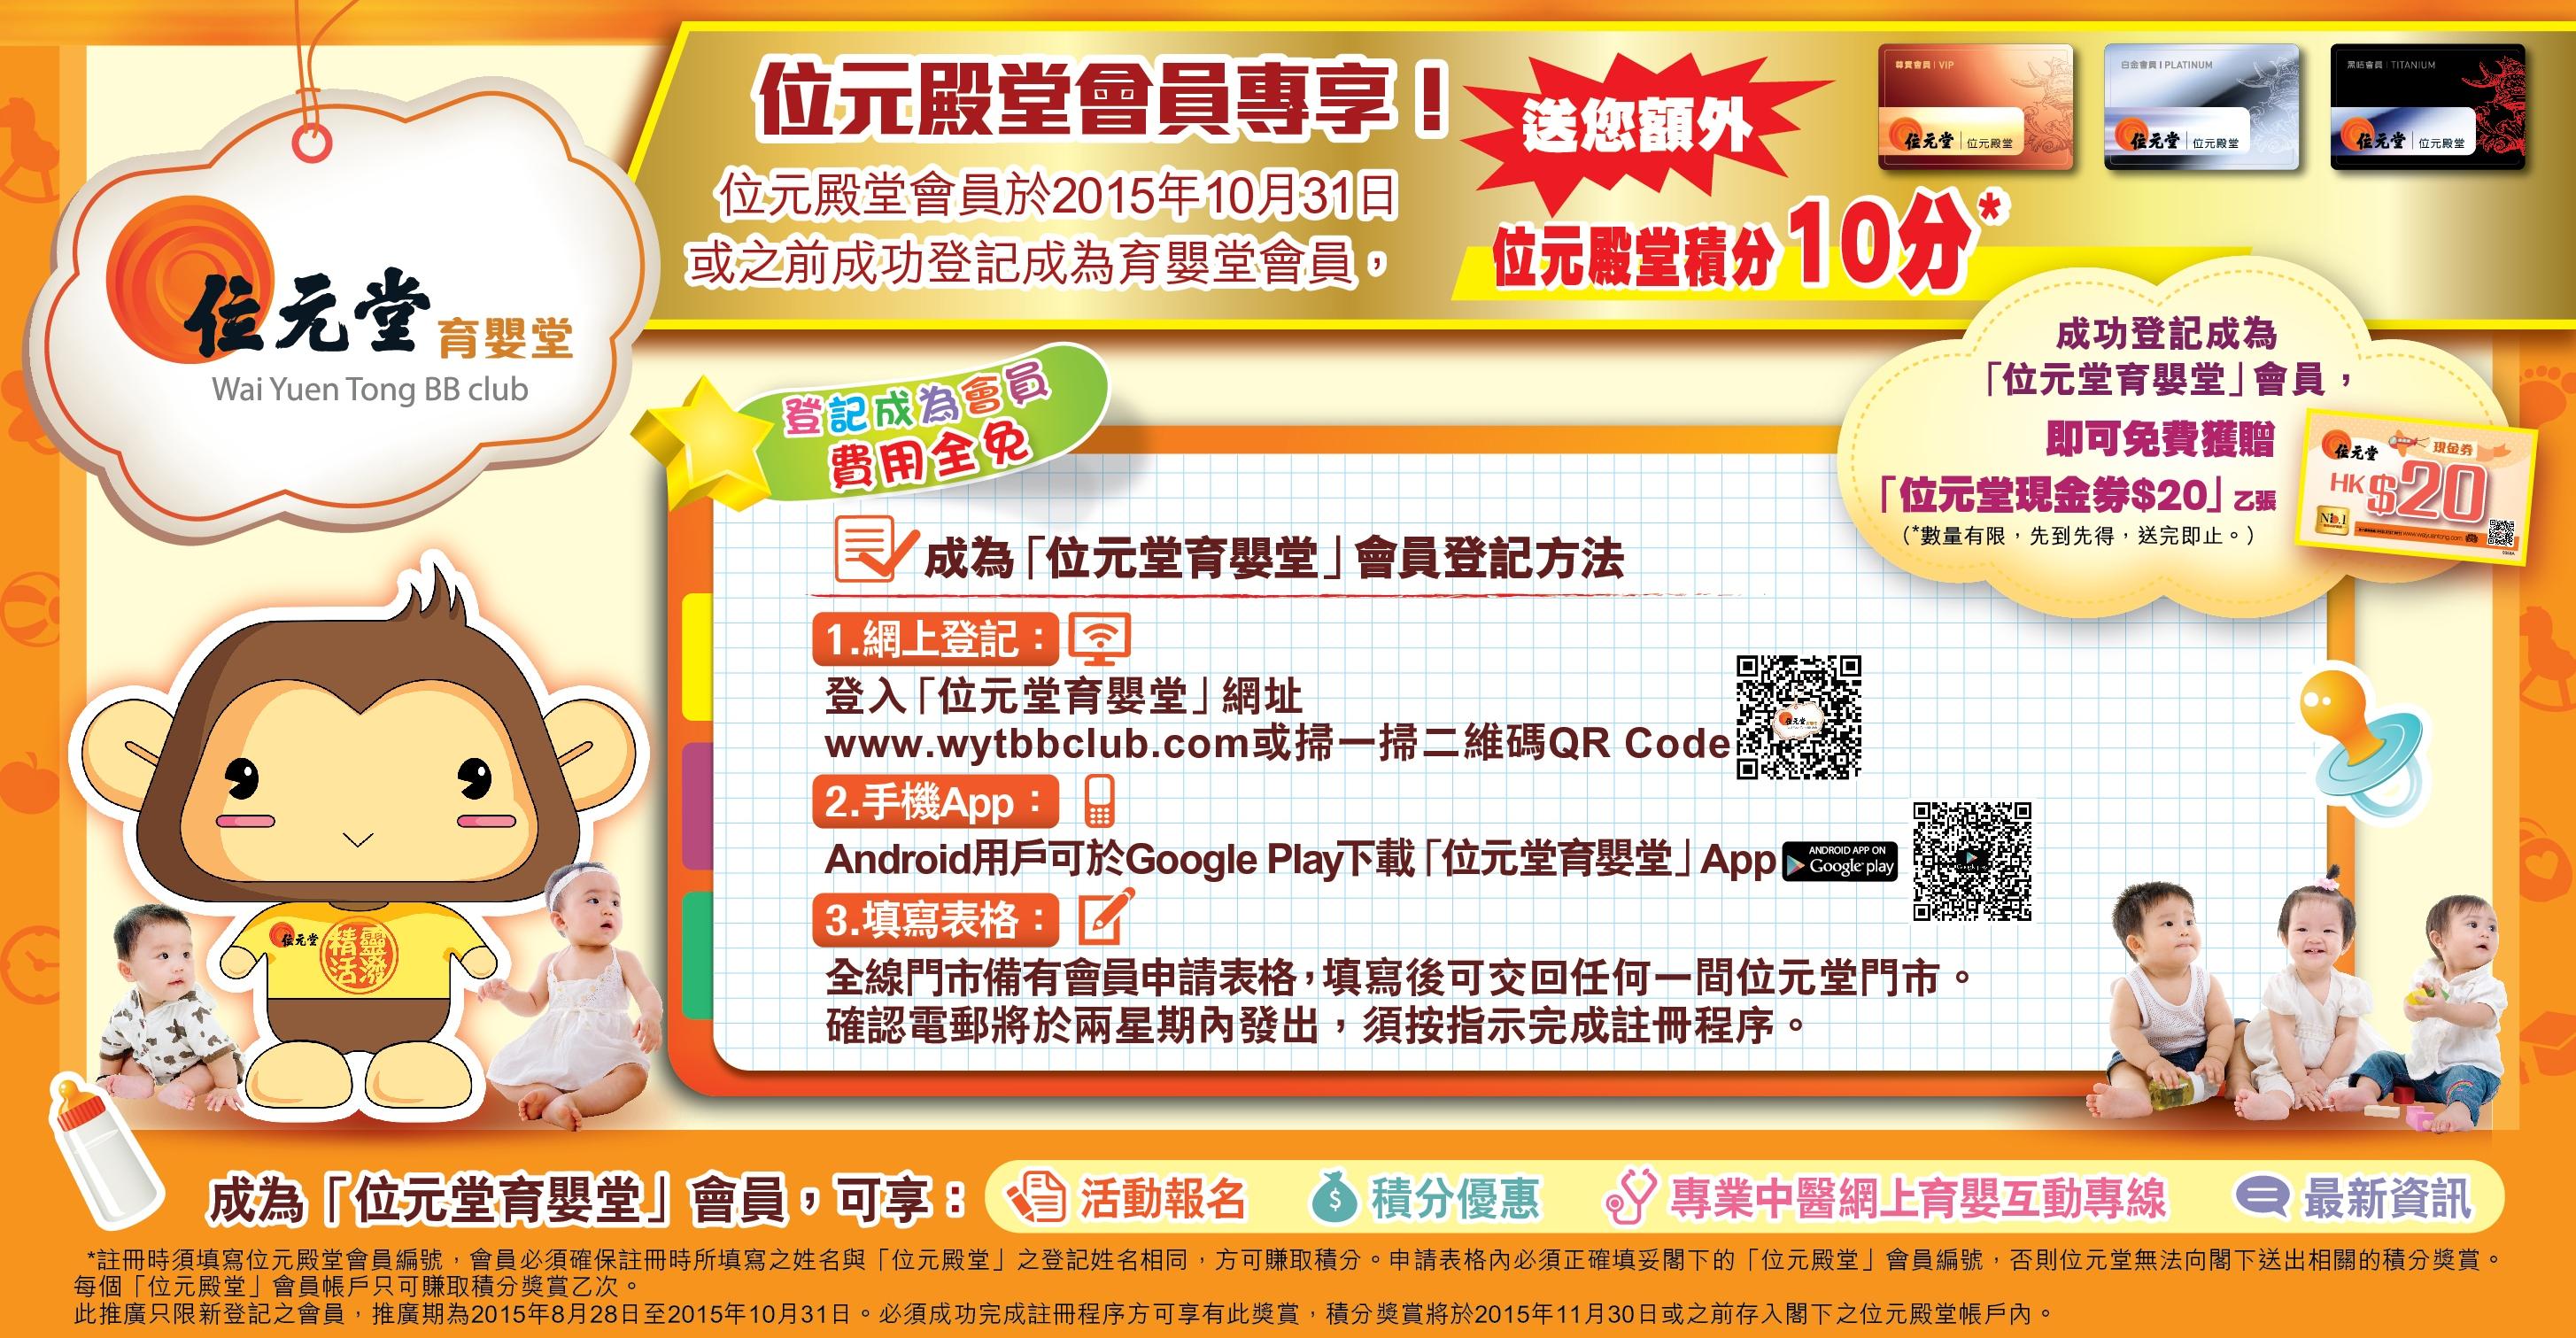 <!--:en-->Wai Yuen Tong member join the BB Club to earn 10 bonus points<!--:--><!--:cn-->位殿堂会员登记成为育婴堂会员,送额外位殿堂积分10分<!--:--><!--:hk-->位元殿堂會員登記成為育嬰堂會員,送額外位元殿堂積分10分<!--:-->